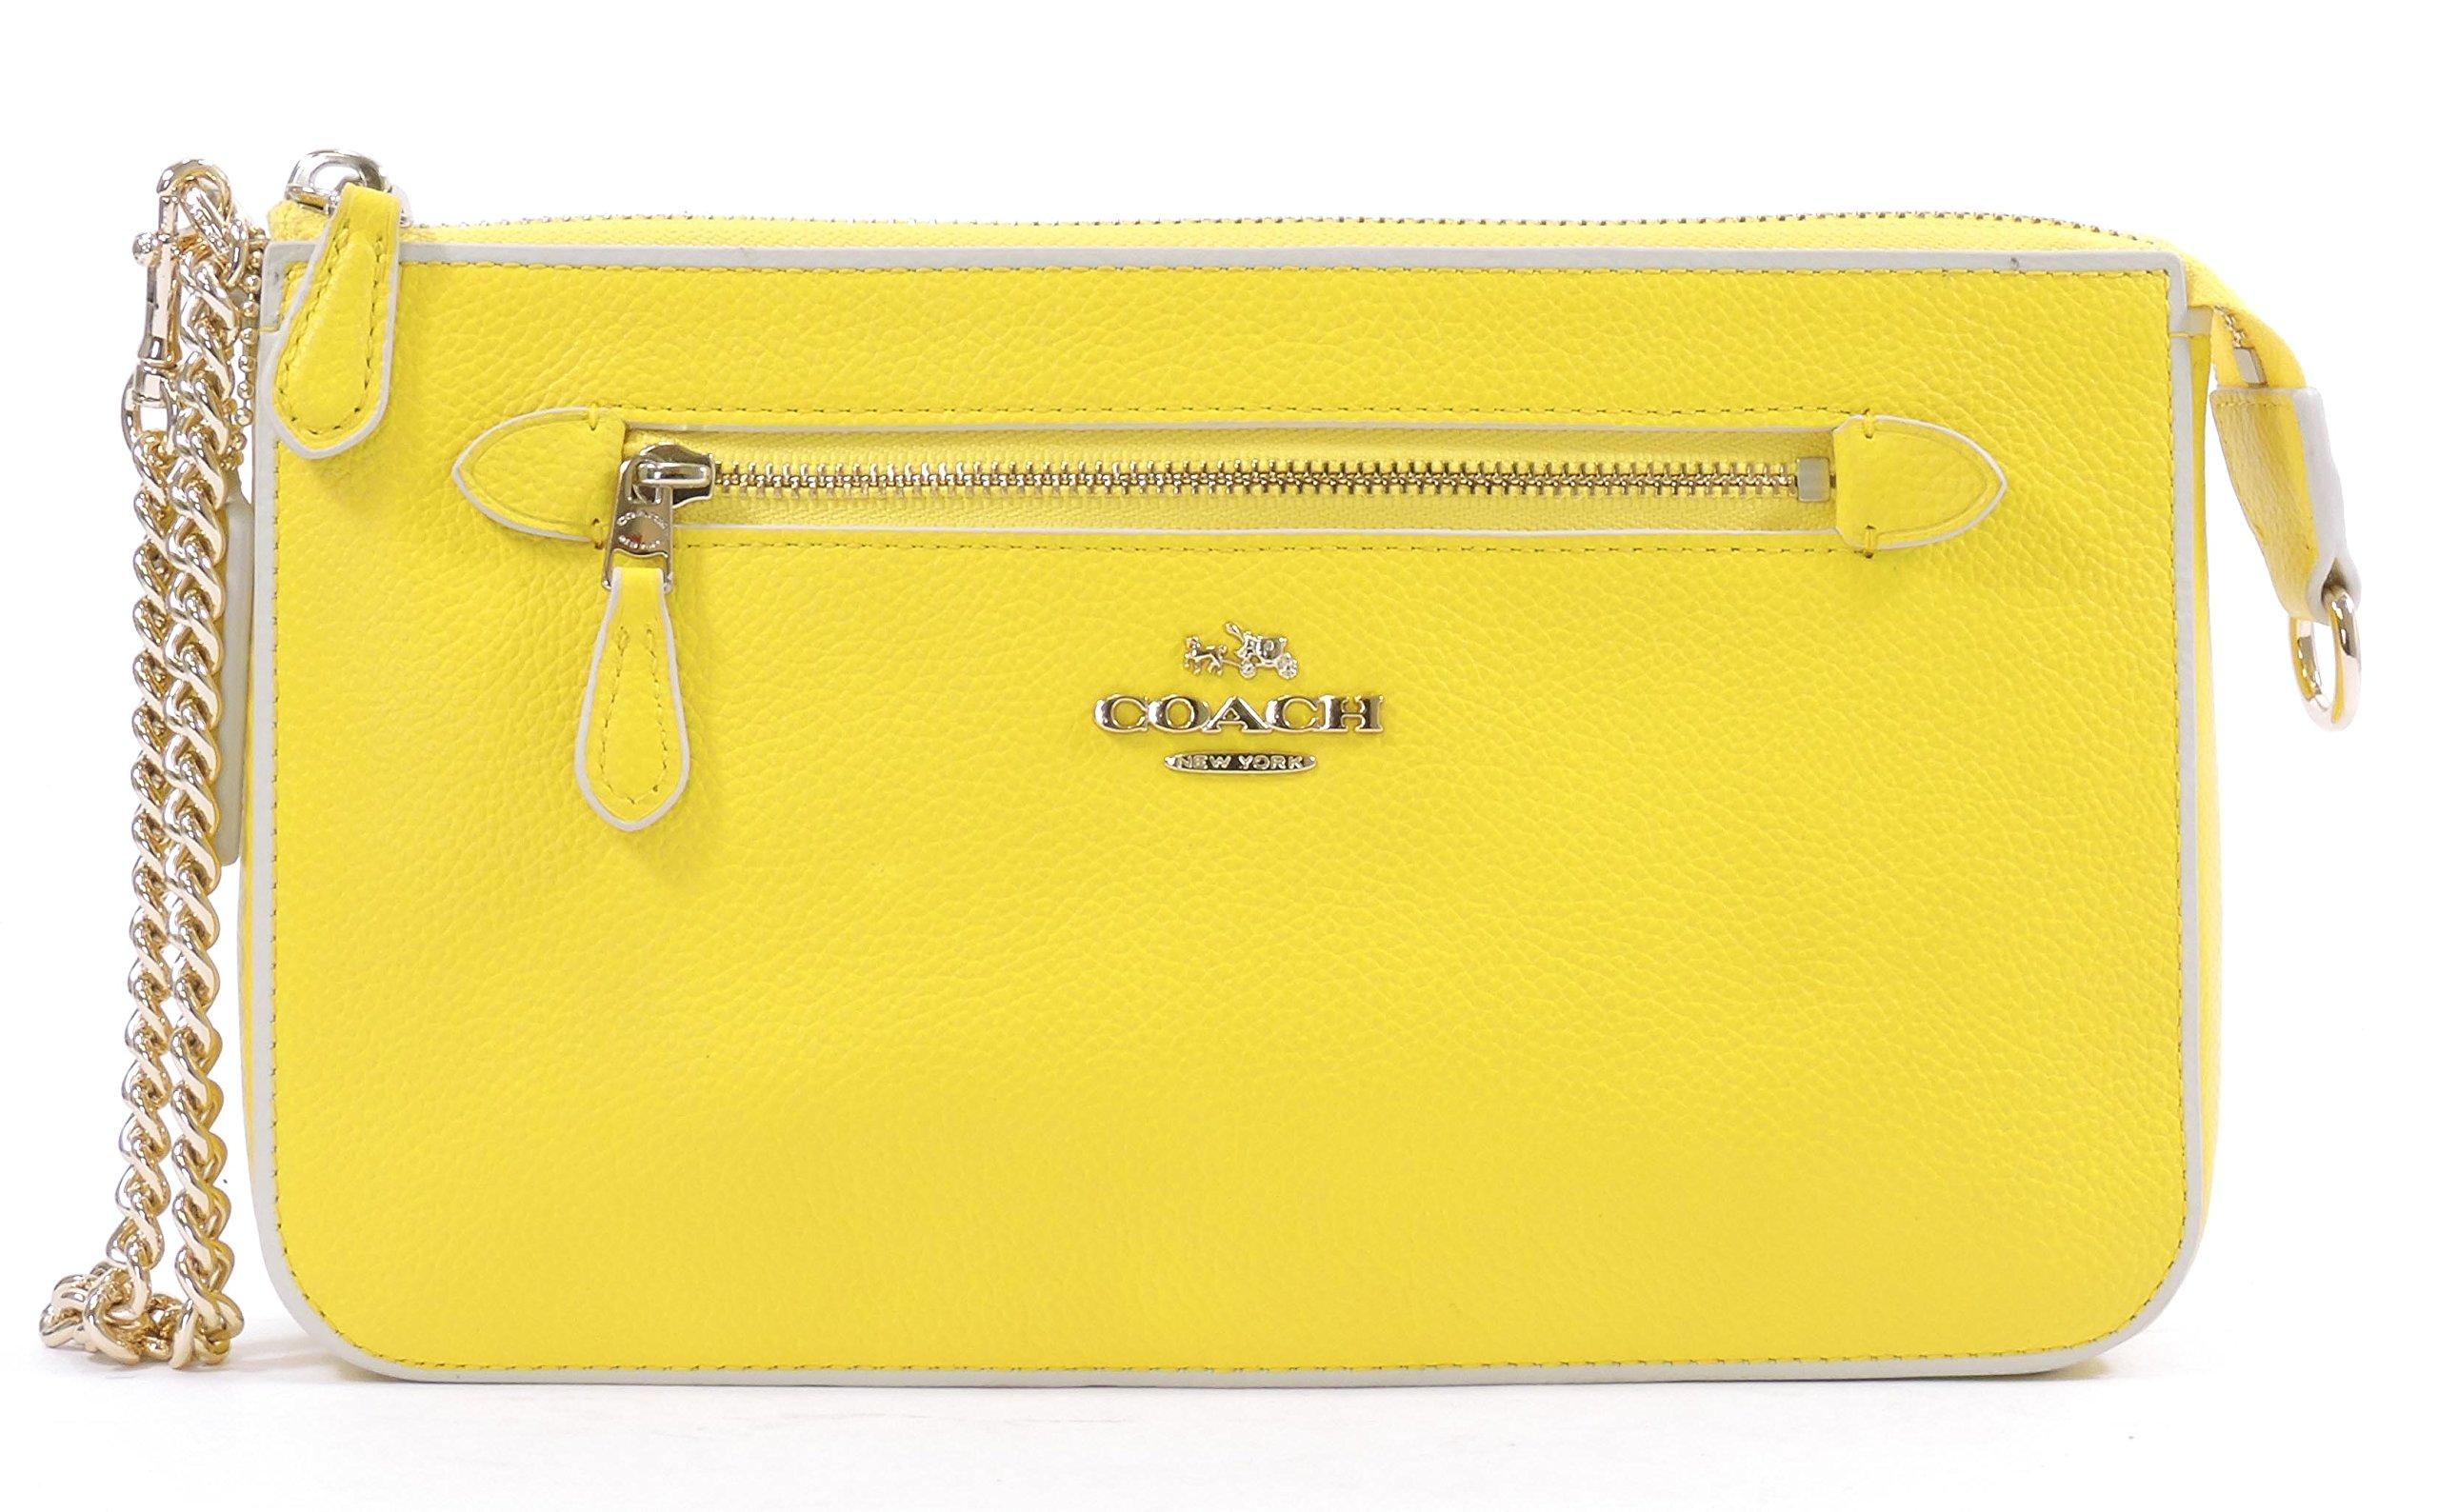 Coach Women's Yellow Chalk Nolita Wristlet 24 Colorblock Leather Wristlet Purse by Coach (Image #1)